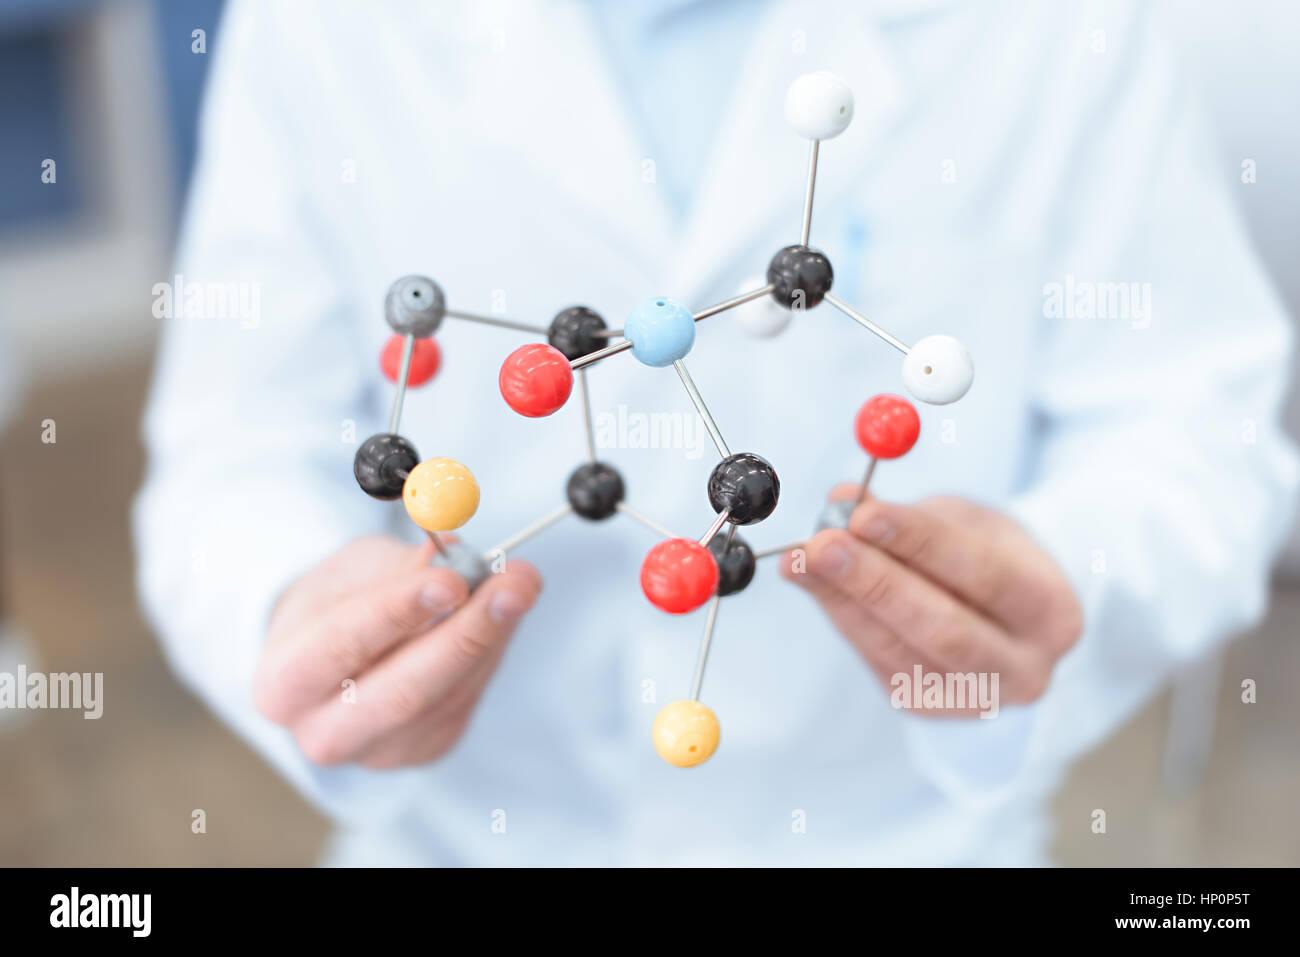 Wissenschaftler im weißen Kittel, molekulare Modell hält Stockbild